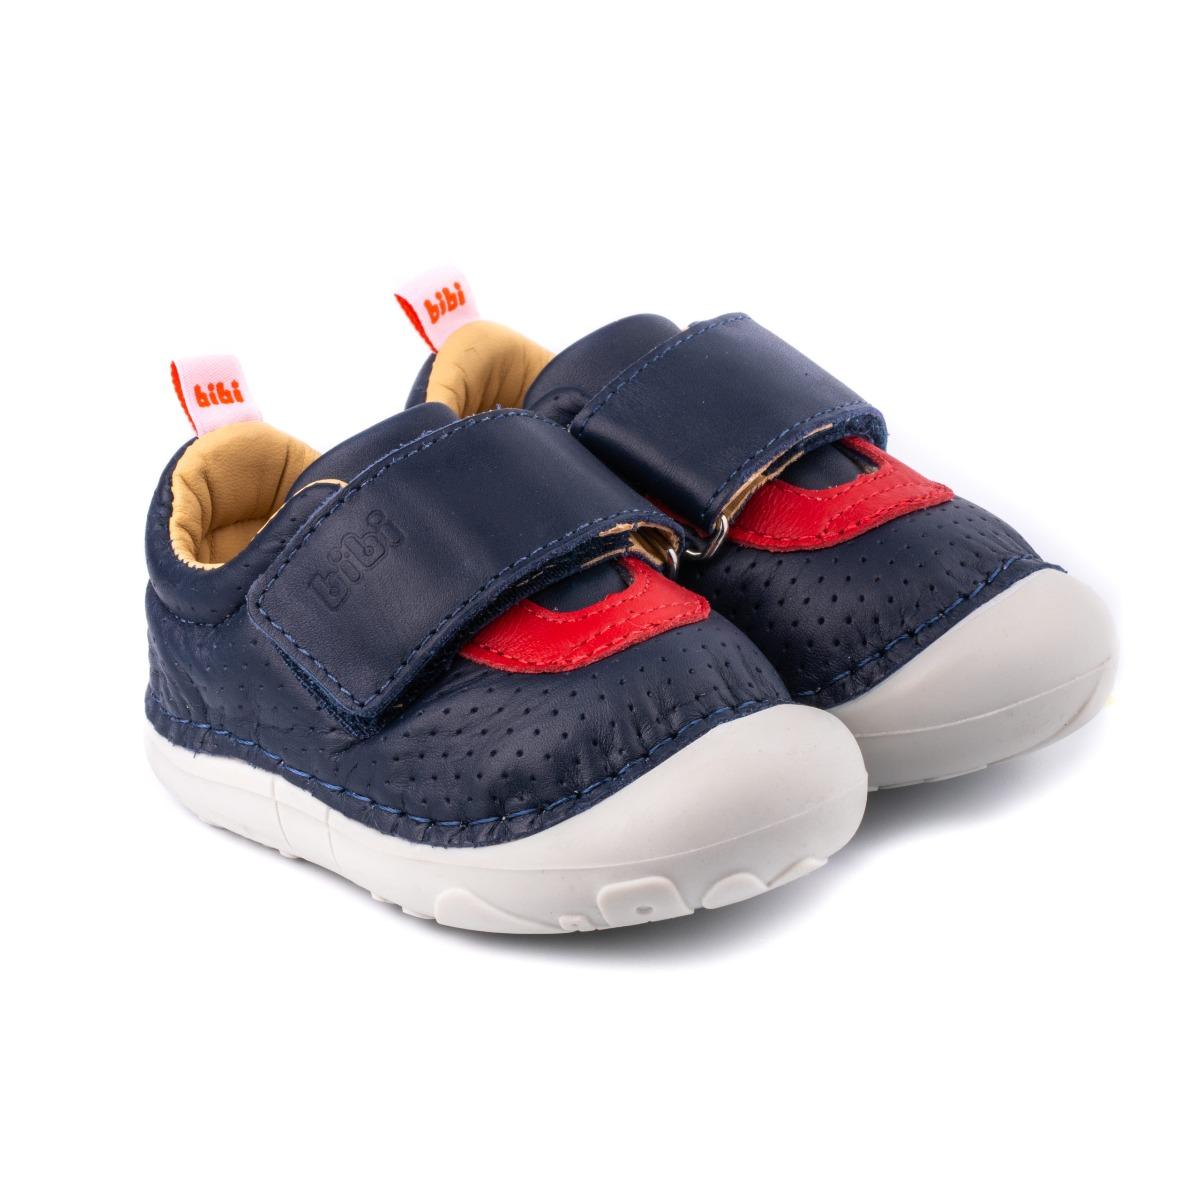 Pantofi sport Bibi Shoes Grow Naval